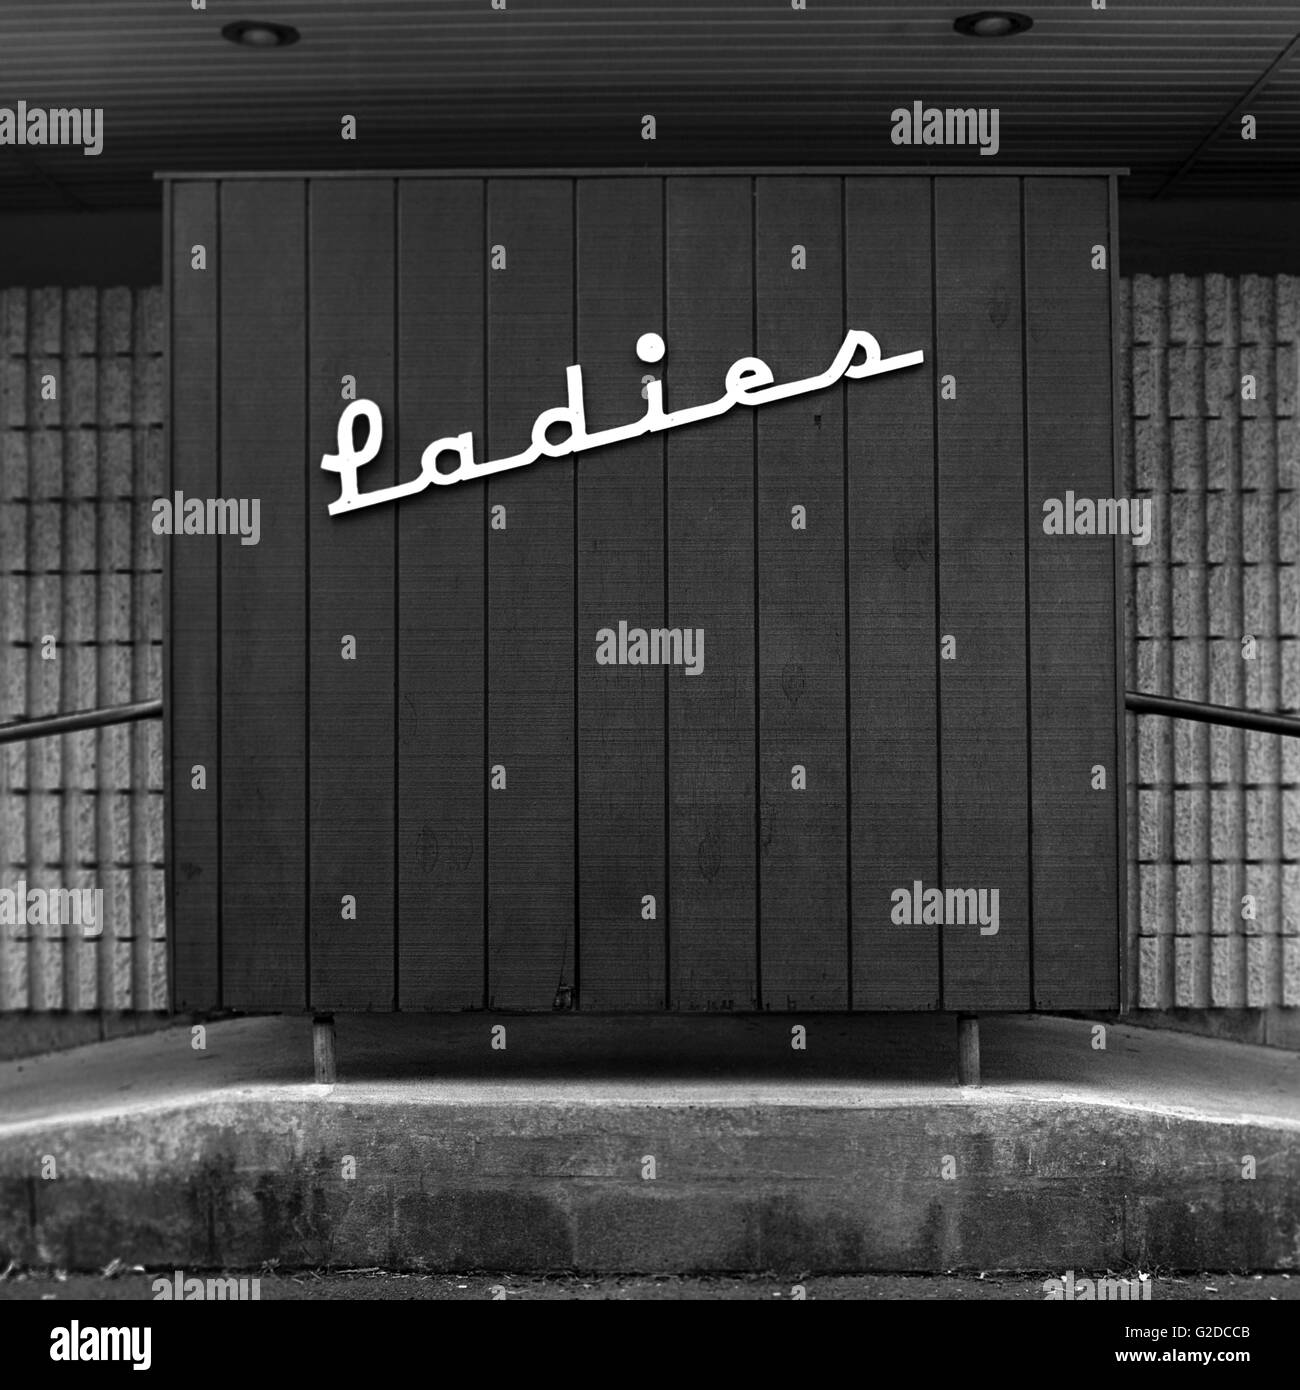 Stylish Ladies Restroom Sign - Stock Image